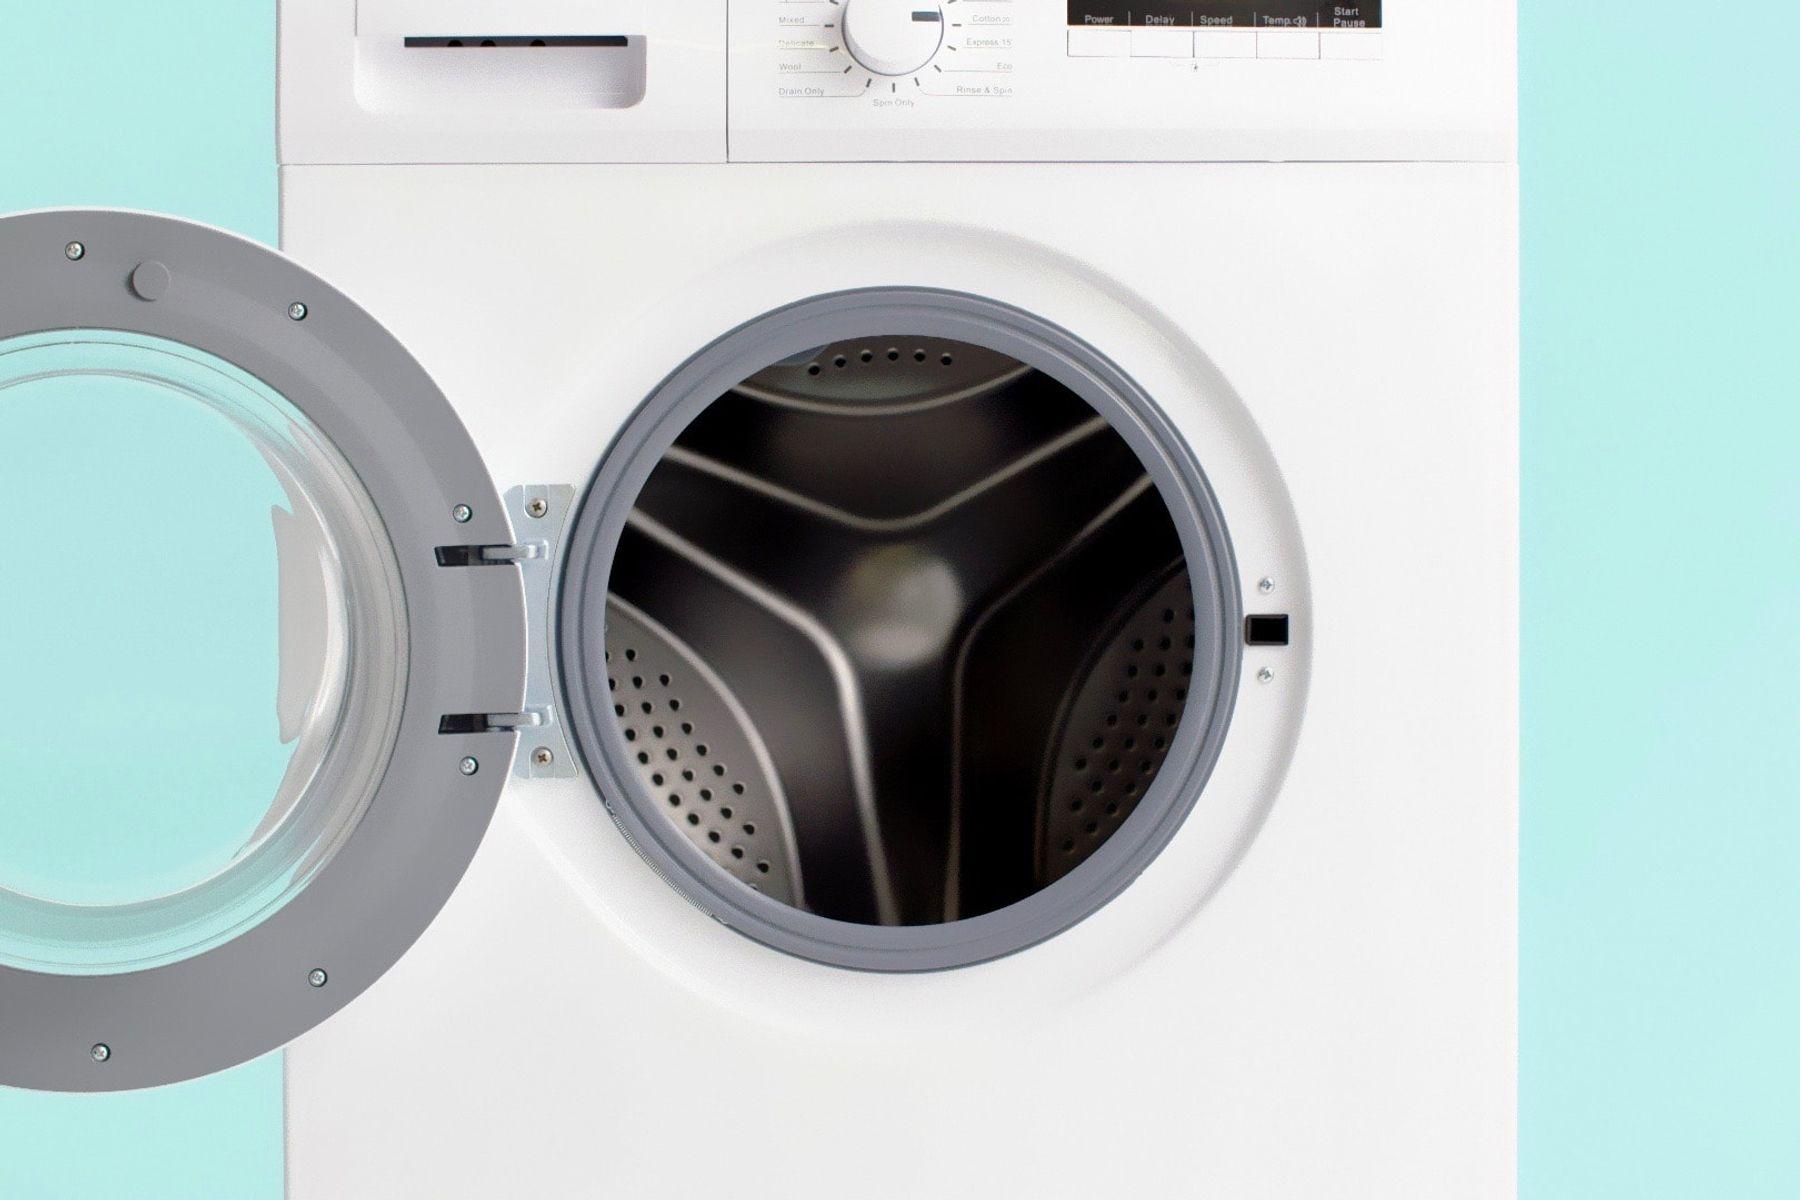 image of tumble dryer